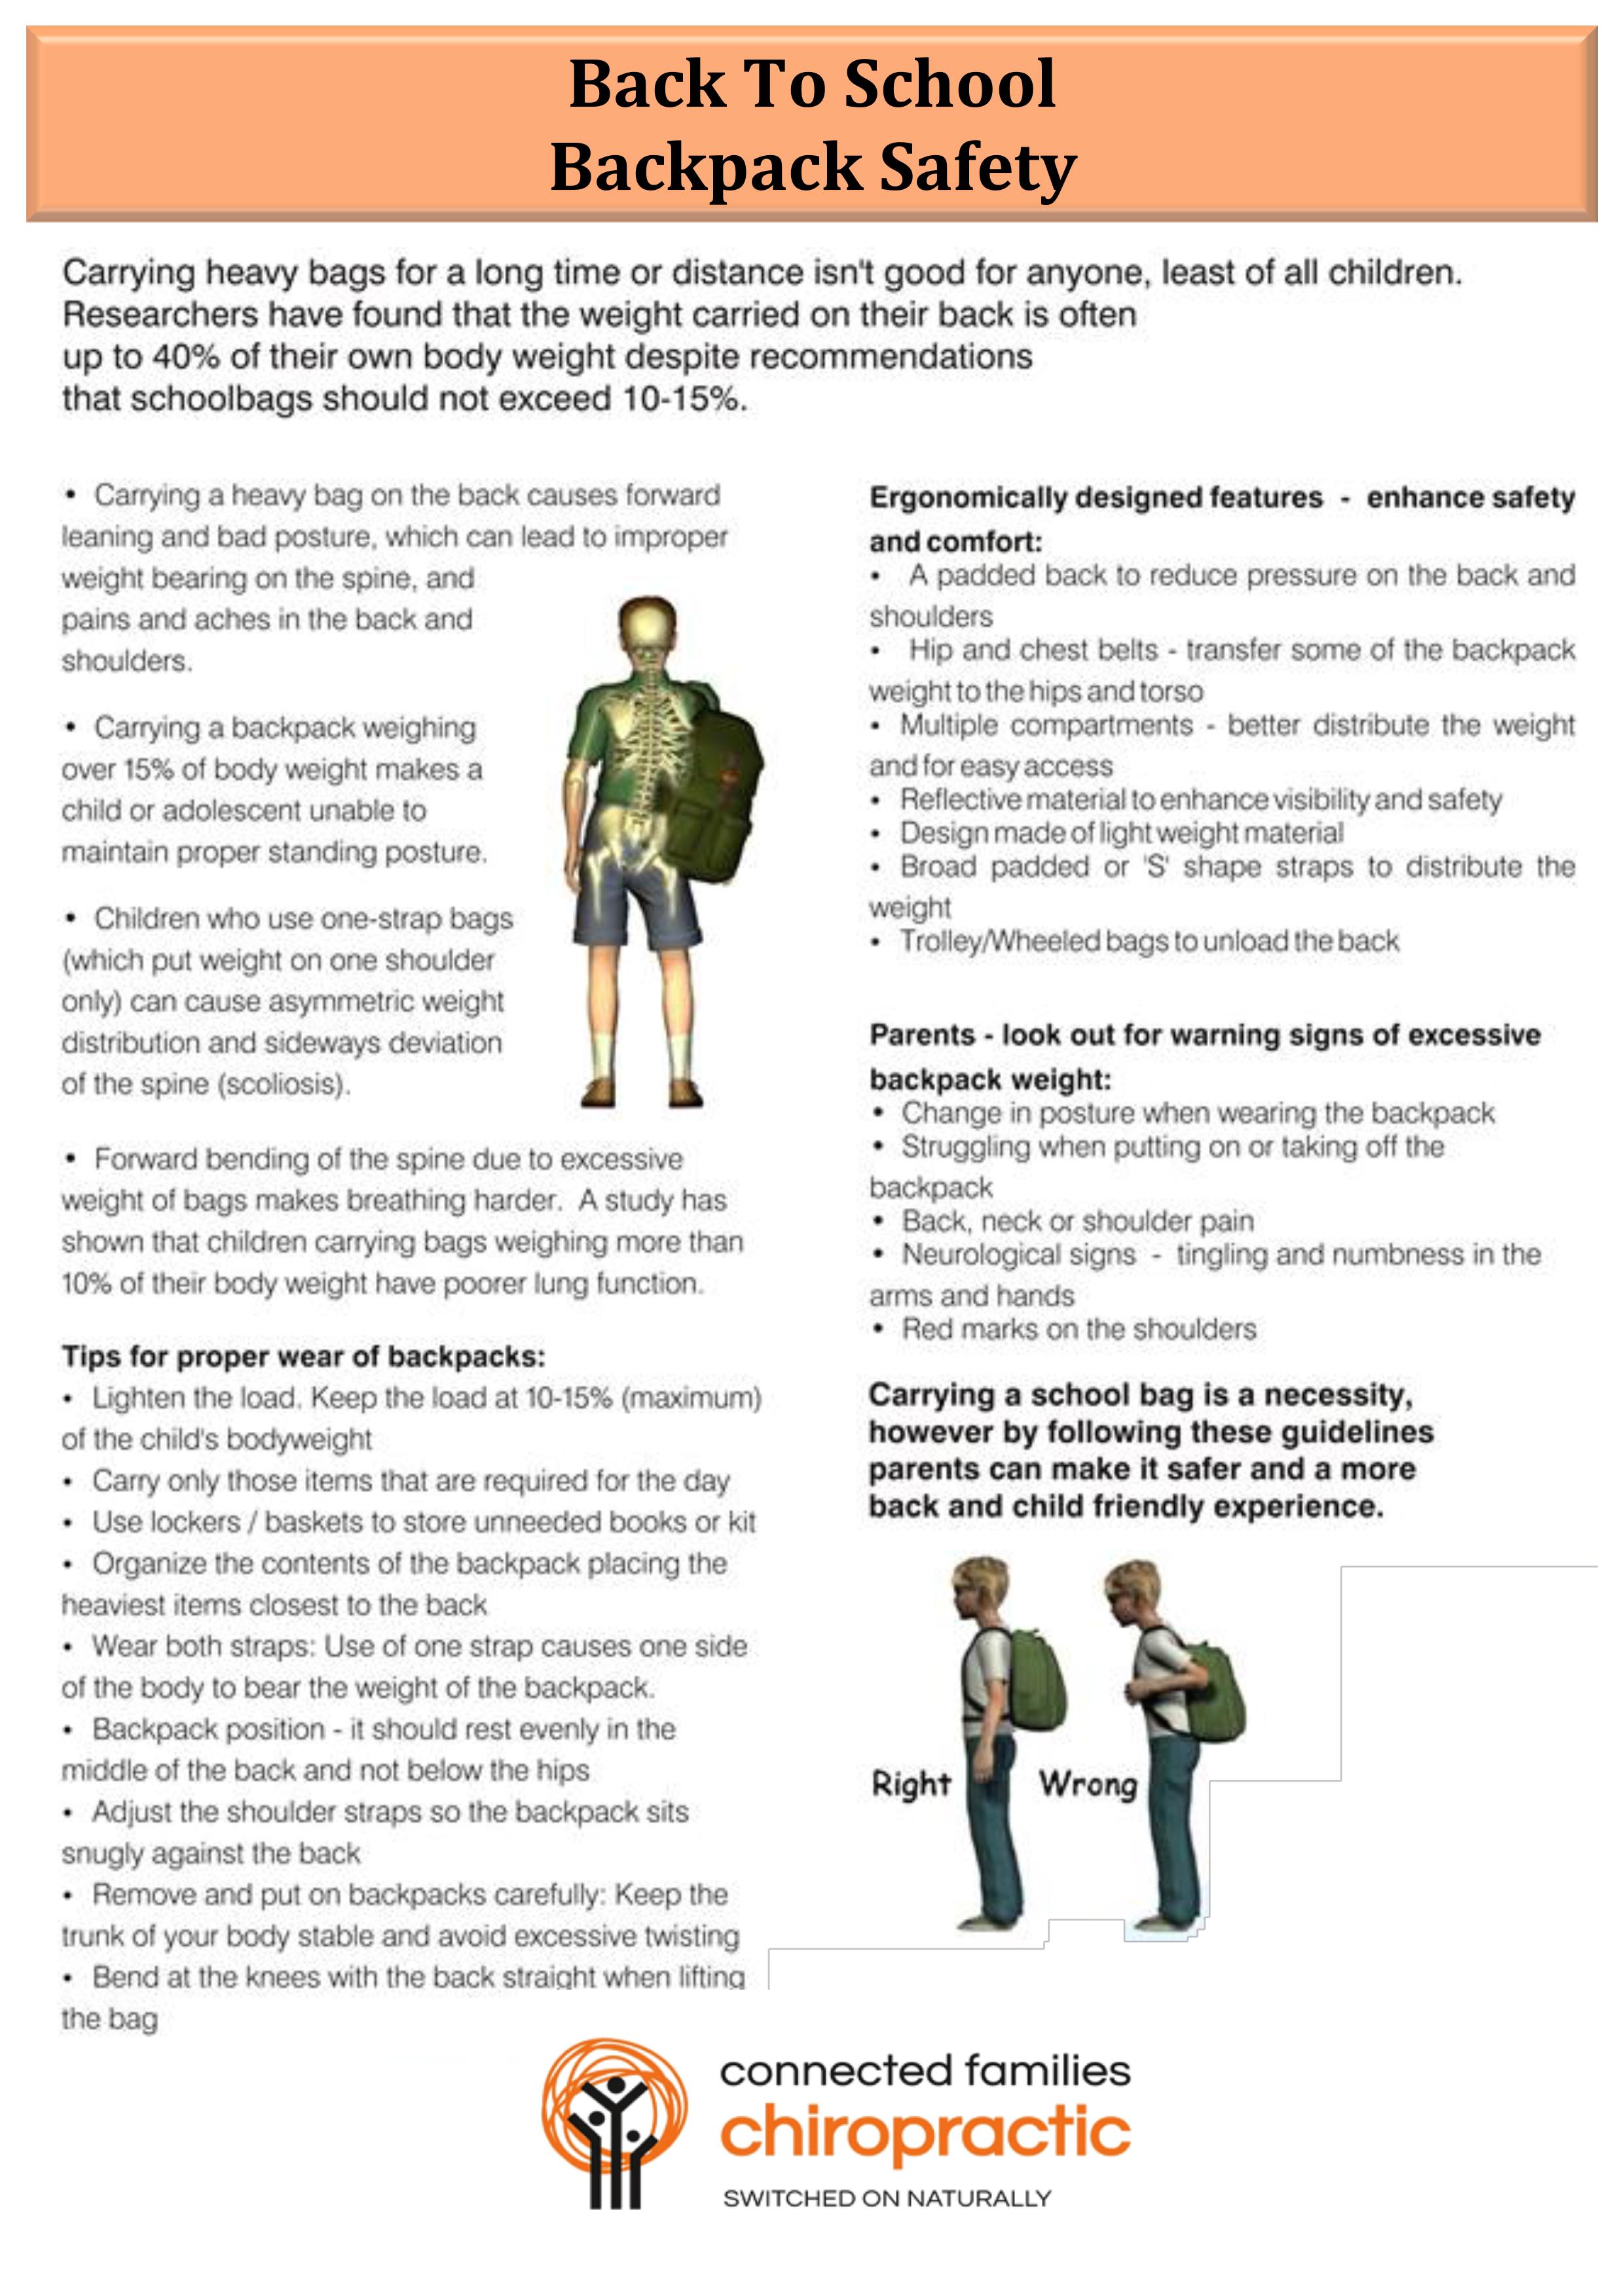 Back to school backpack safety.jpg